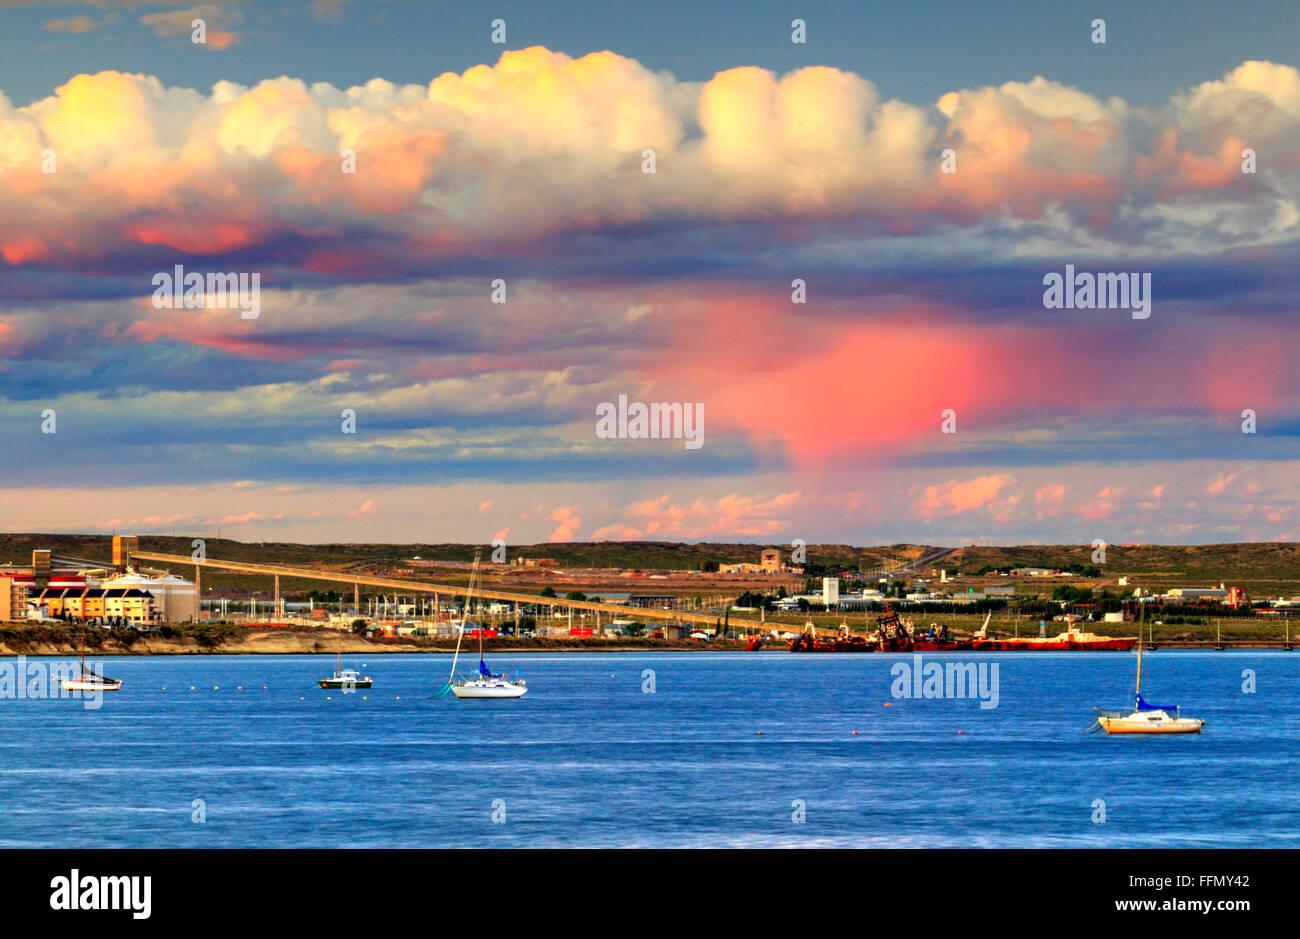 Las costas de Puerto Madryn. Chubut, Argentina. Imagen De Stock